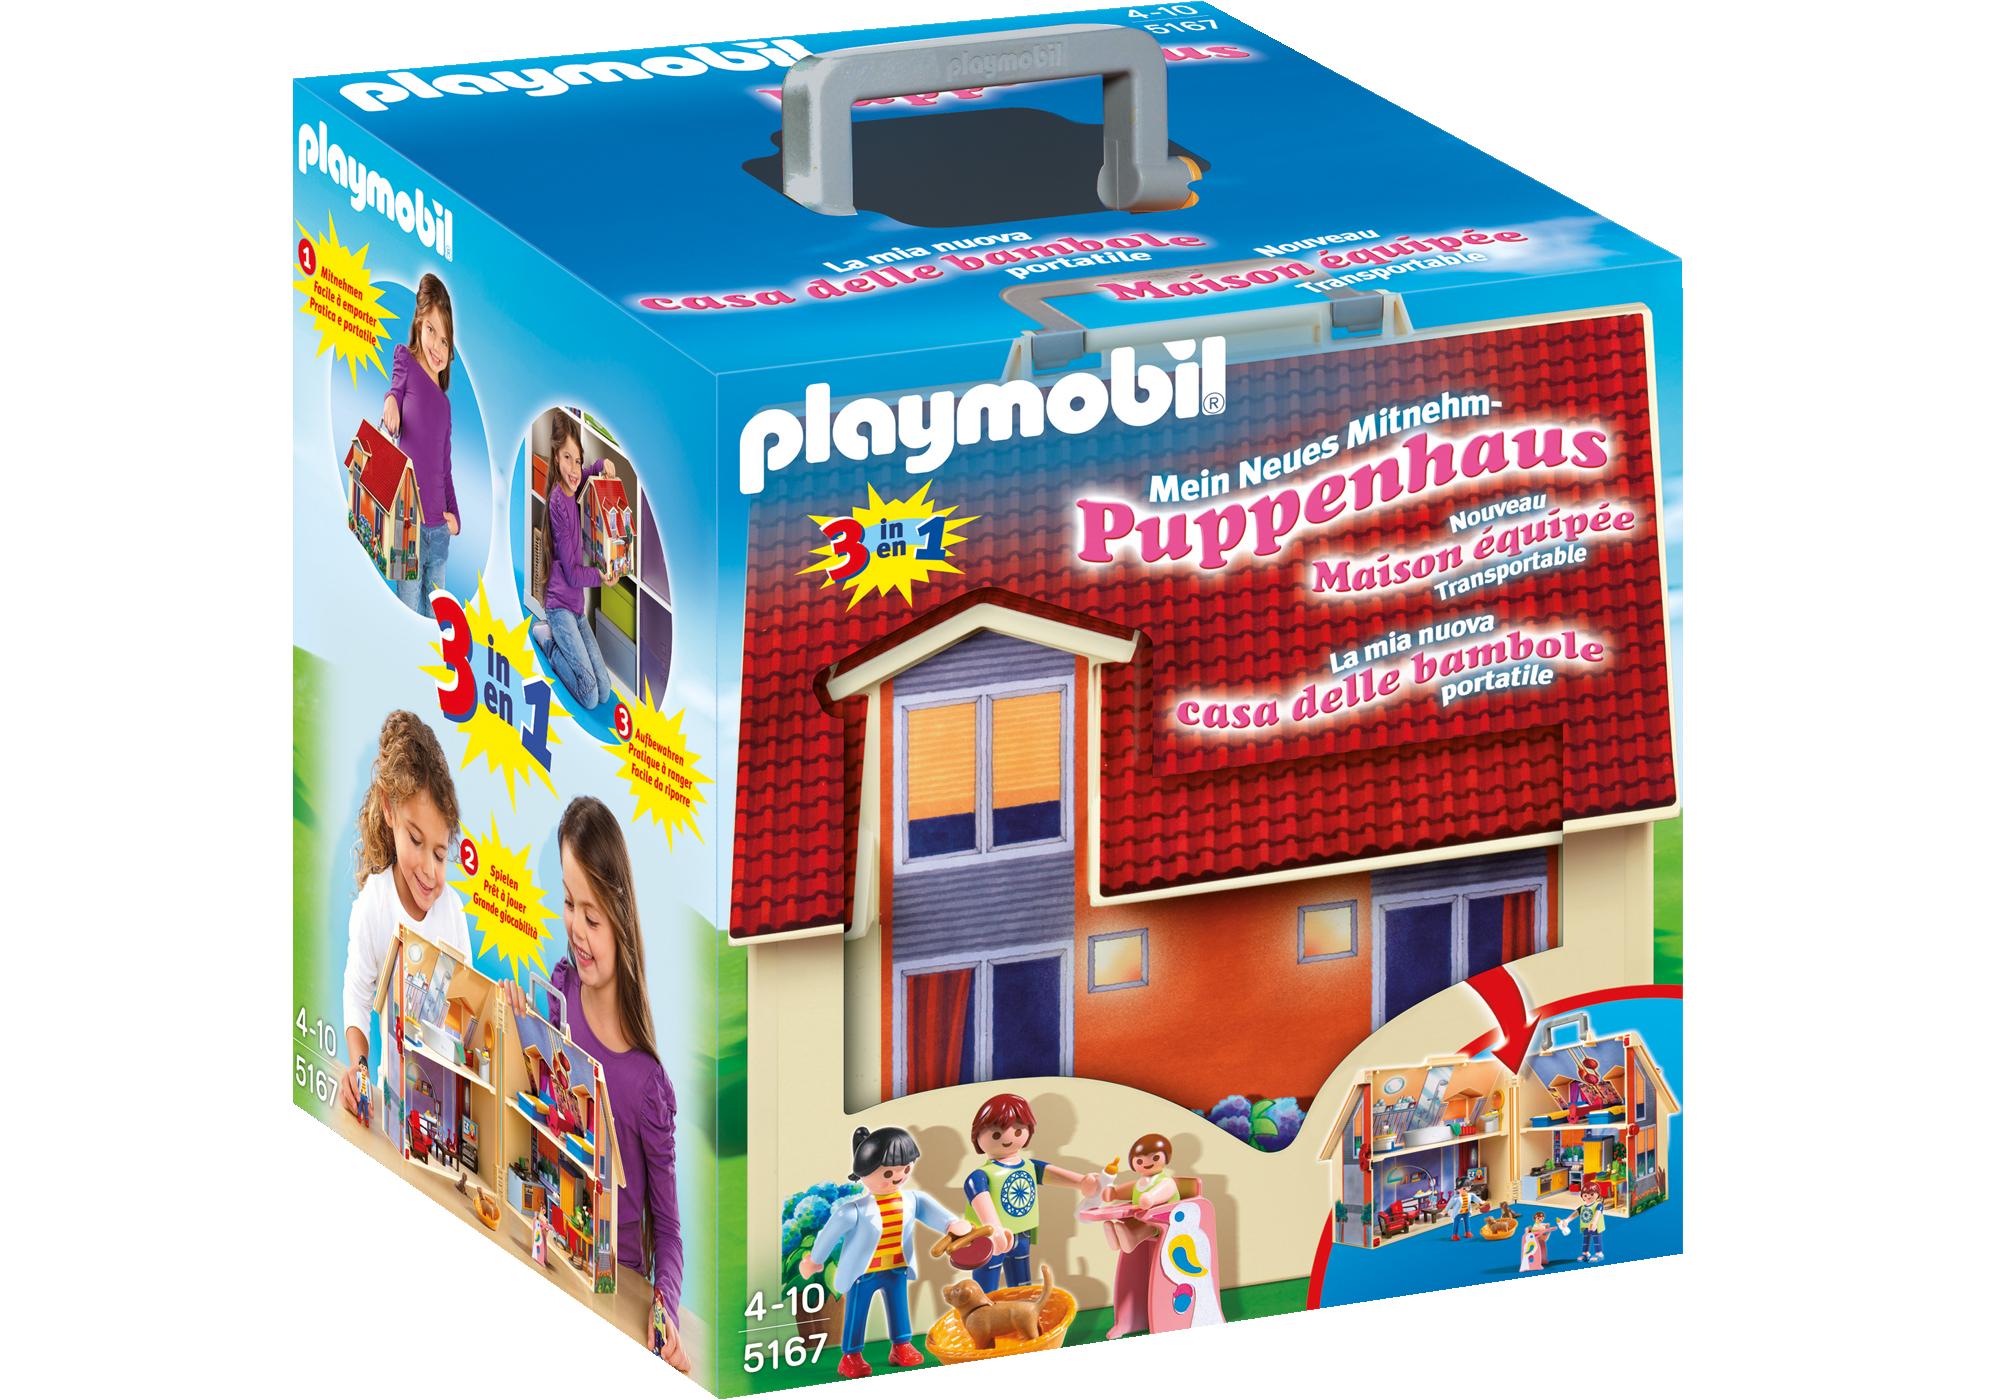 http://media.playmobil.com/i/playmobil/5167_product_box_front/Neues Mitnehm-Puppenhaus